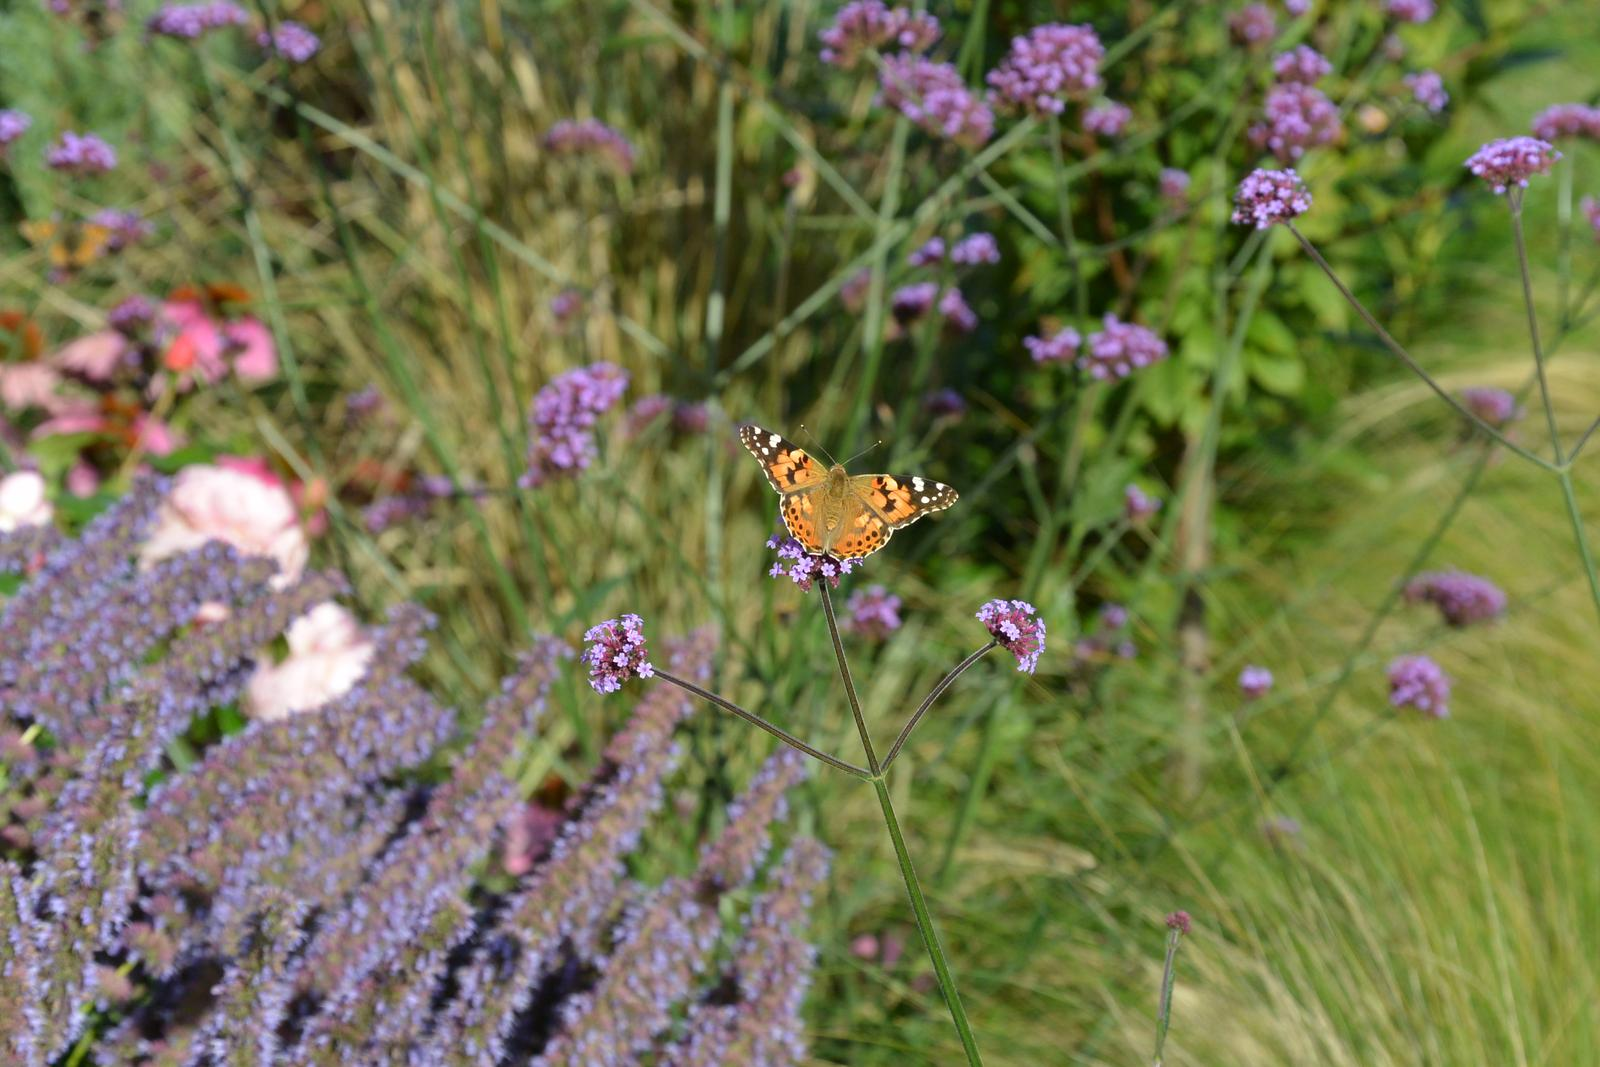 Motýlí zahrada 2019-2020 - Obrázek č. 109